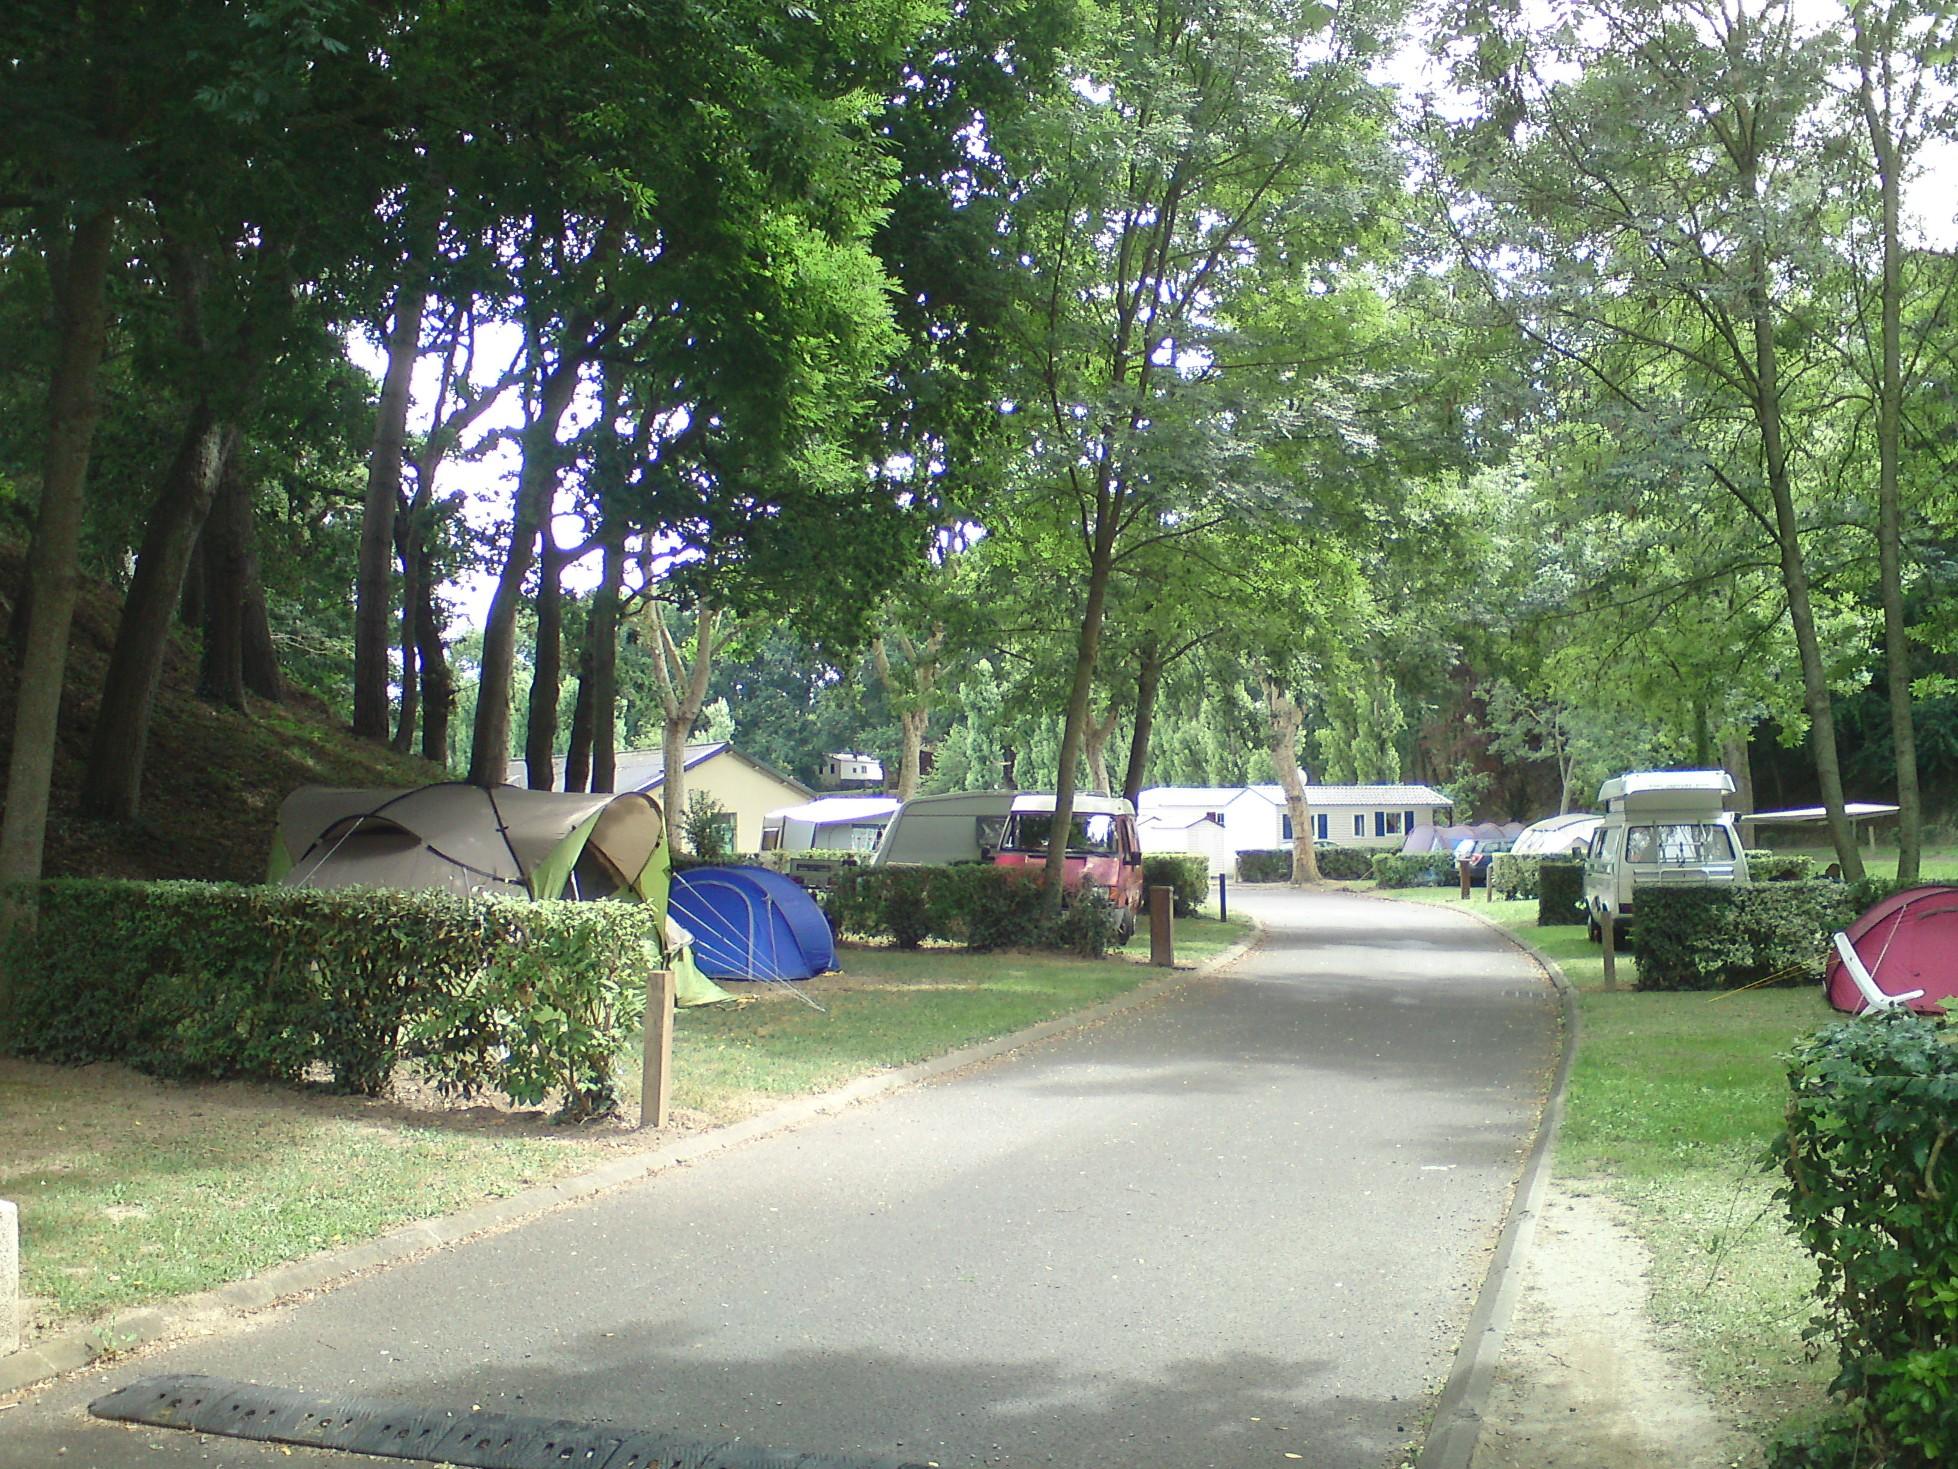 Camper van parks